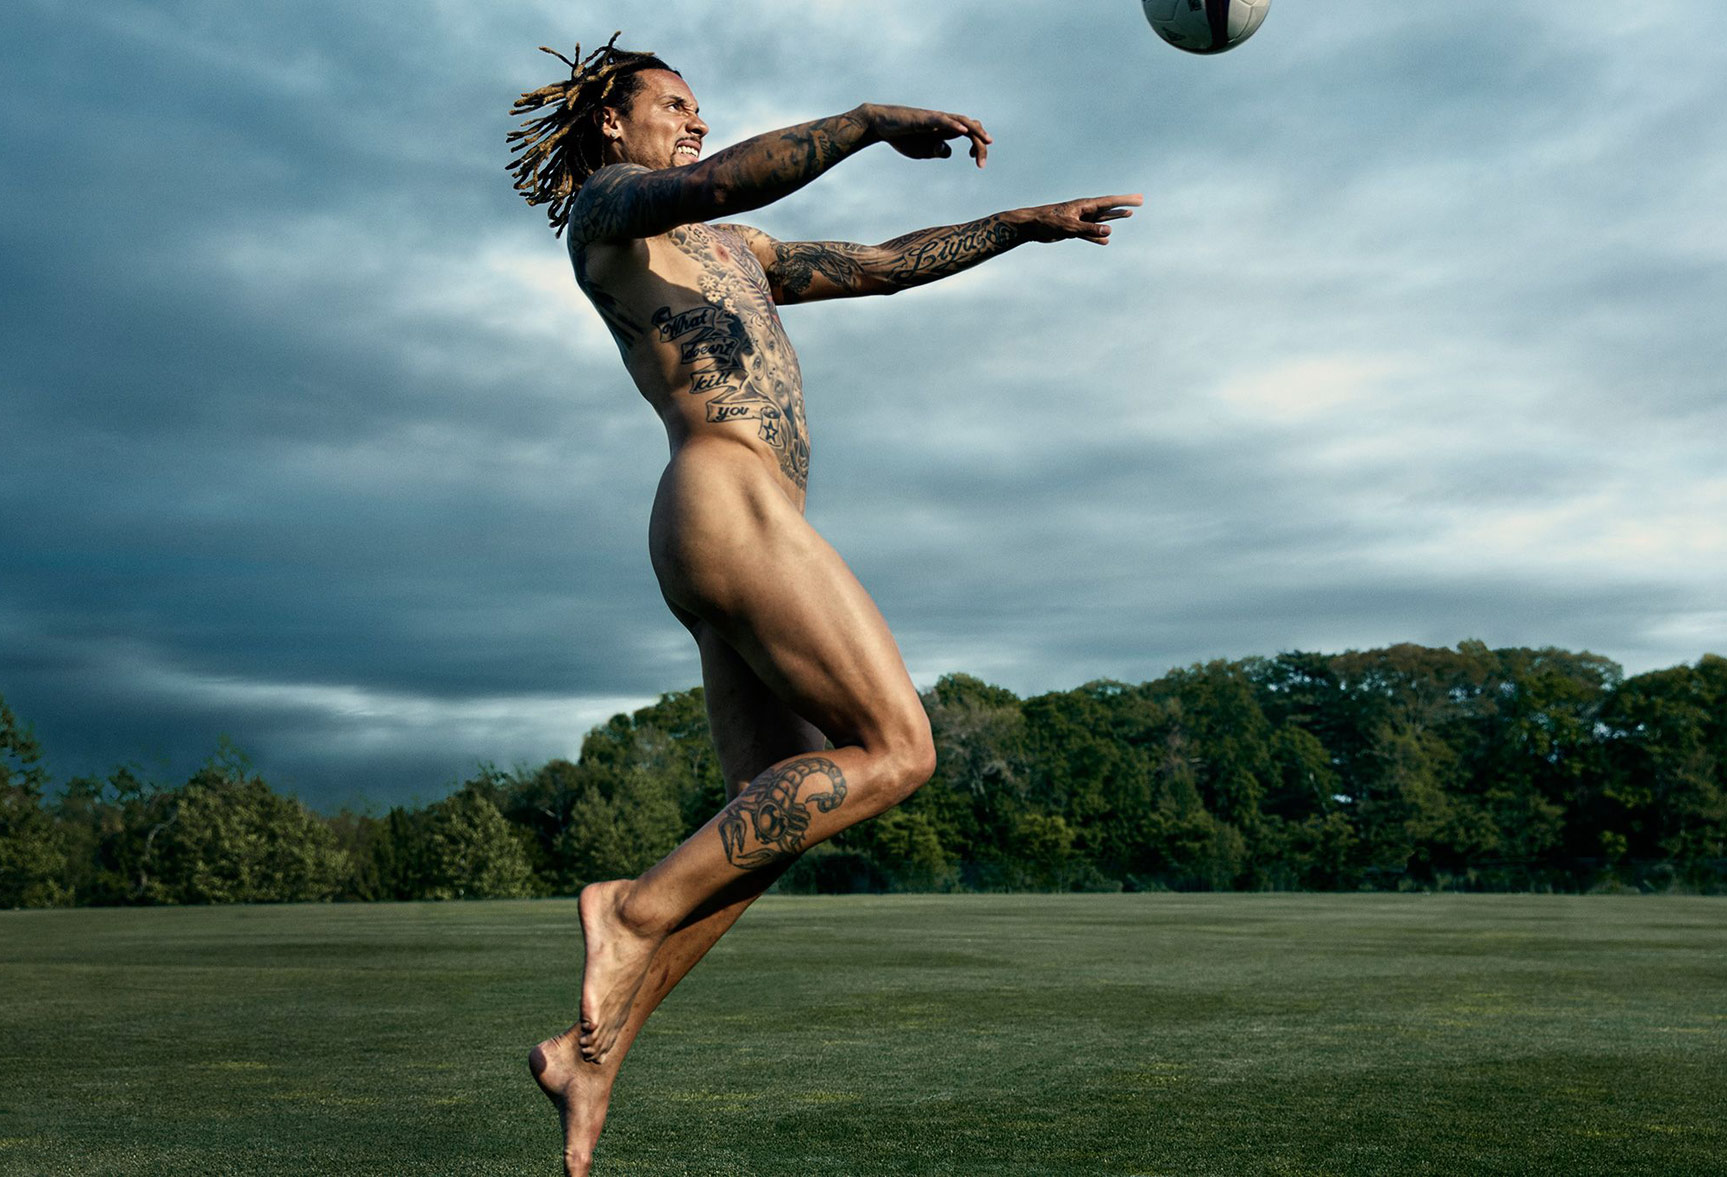 ESPN Magazine The Body Issue 2015 - Jermaine Jones / Джермейн Джонс - Культ тела журнала ESPN